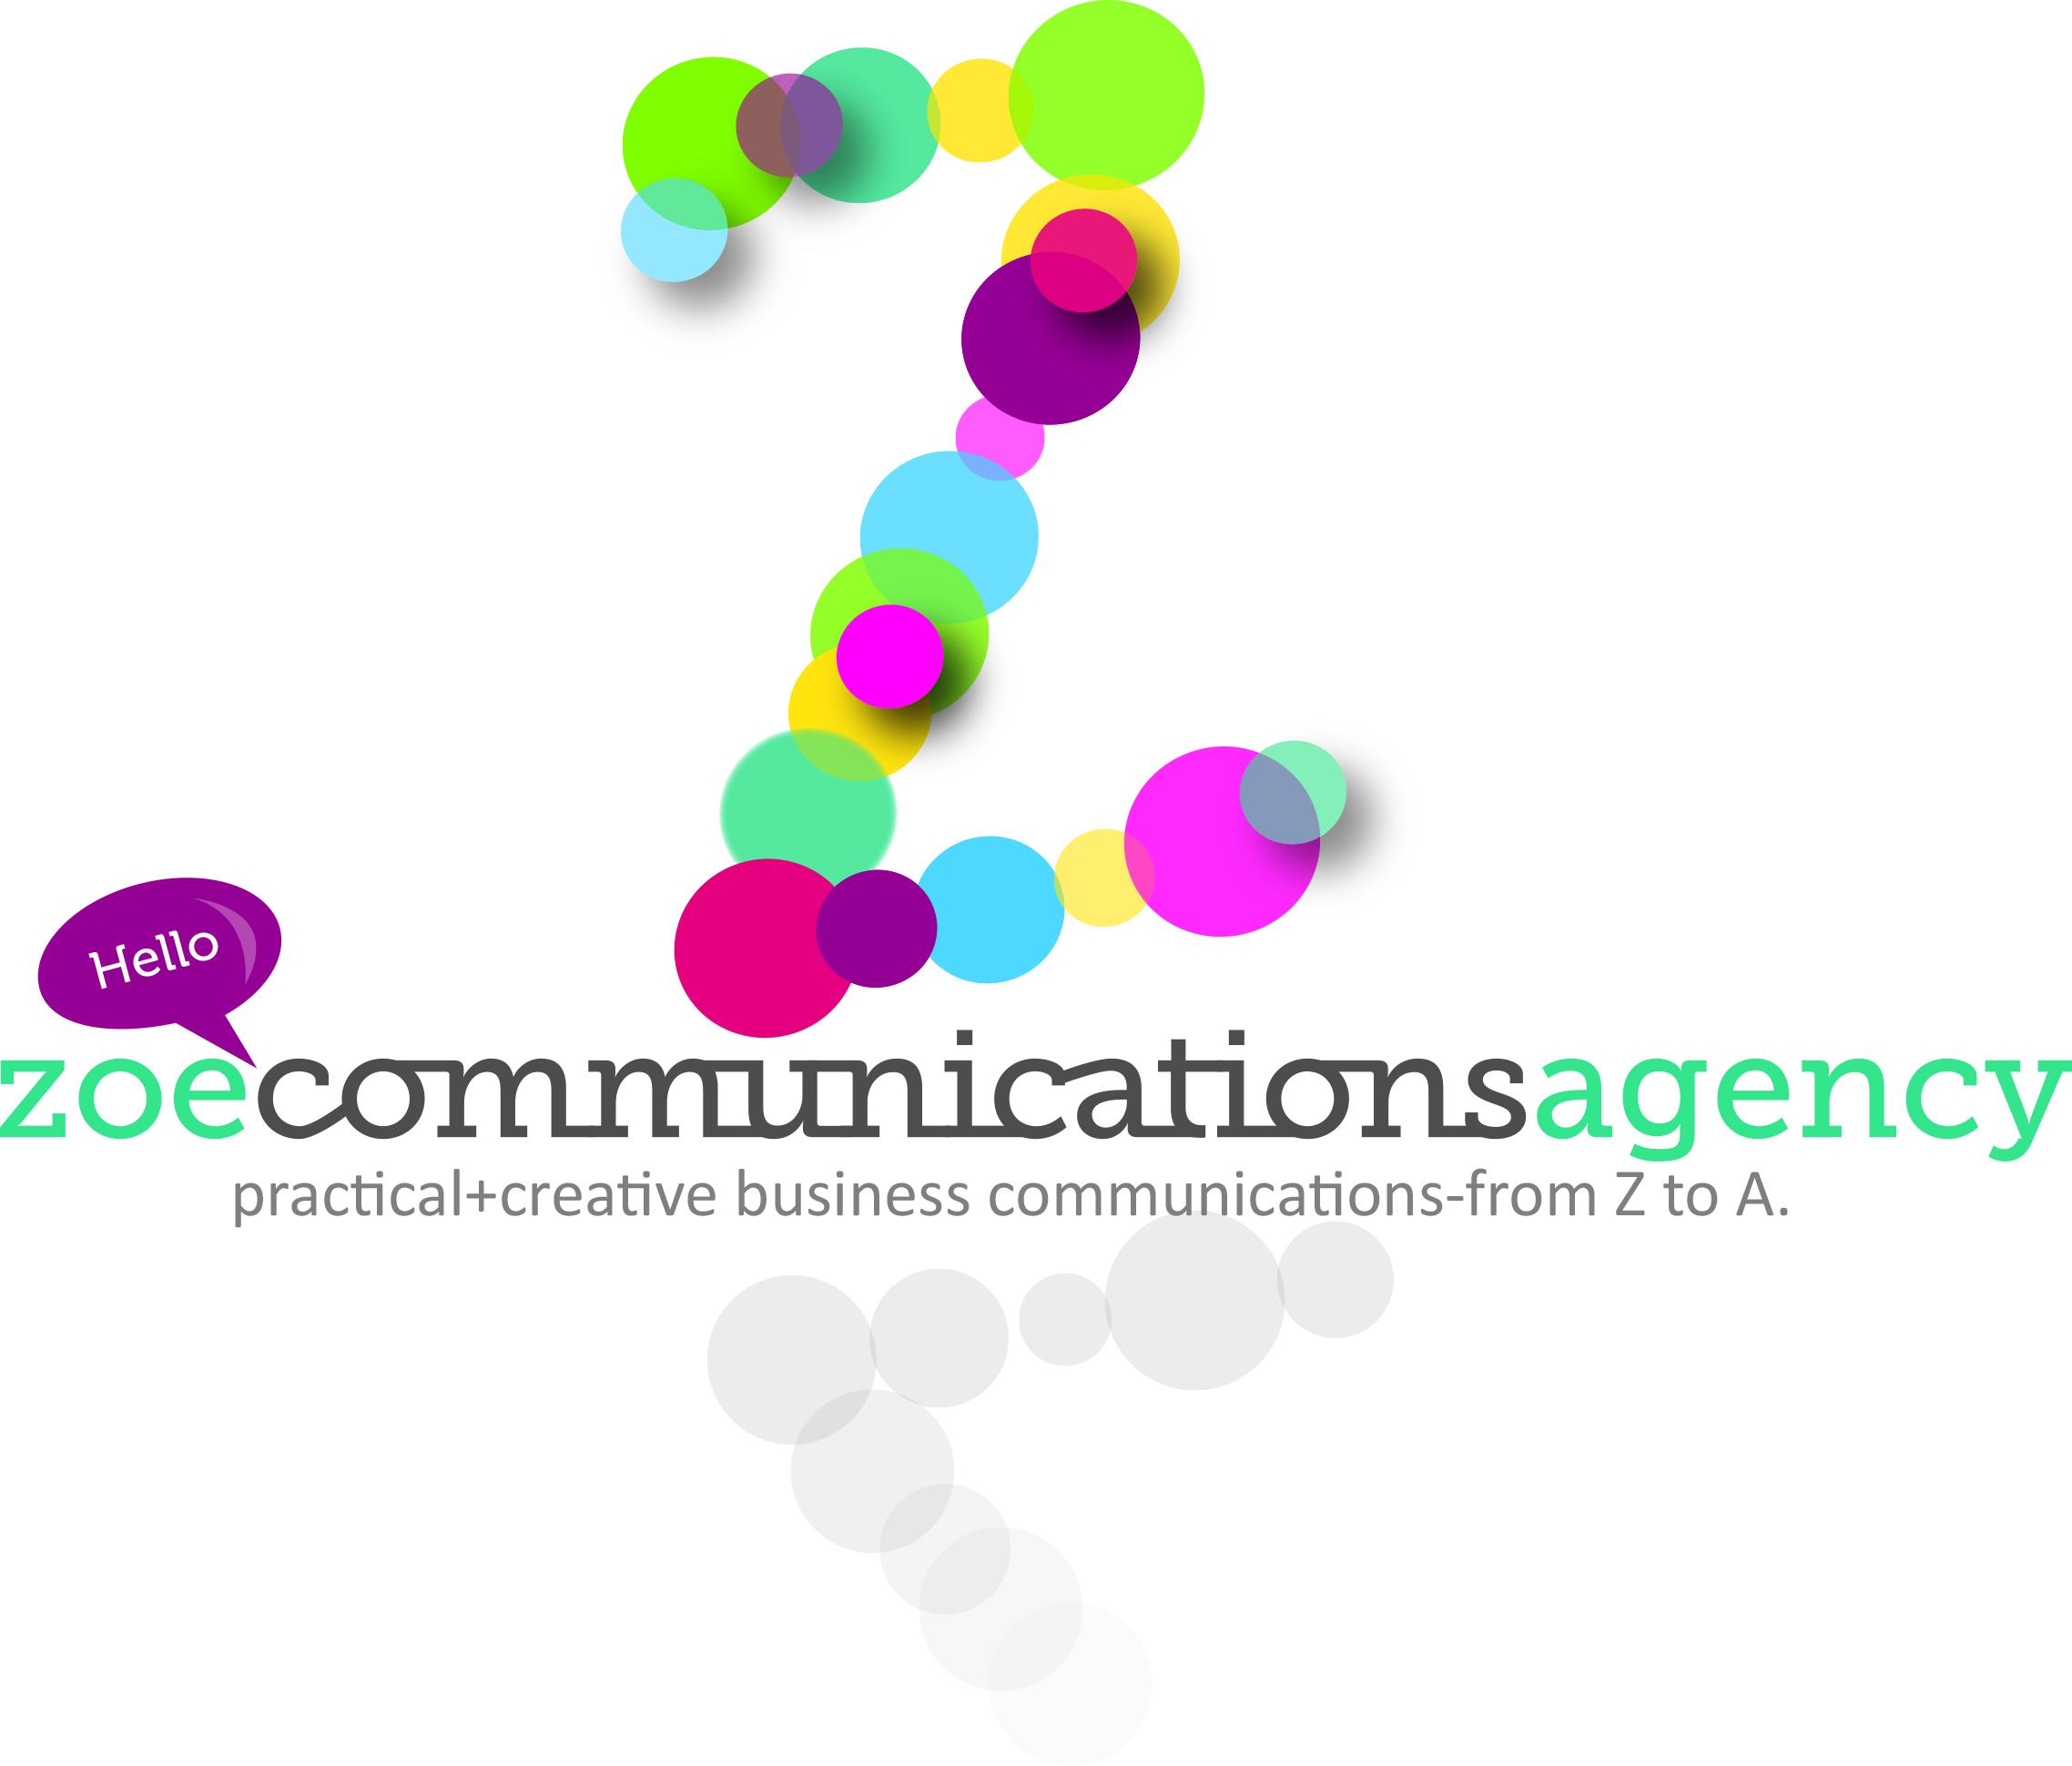 Zoe Communications Agency Logo 2019.jpg